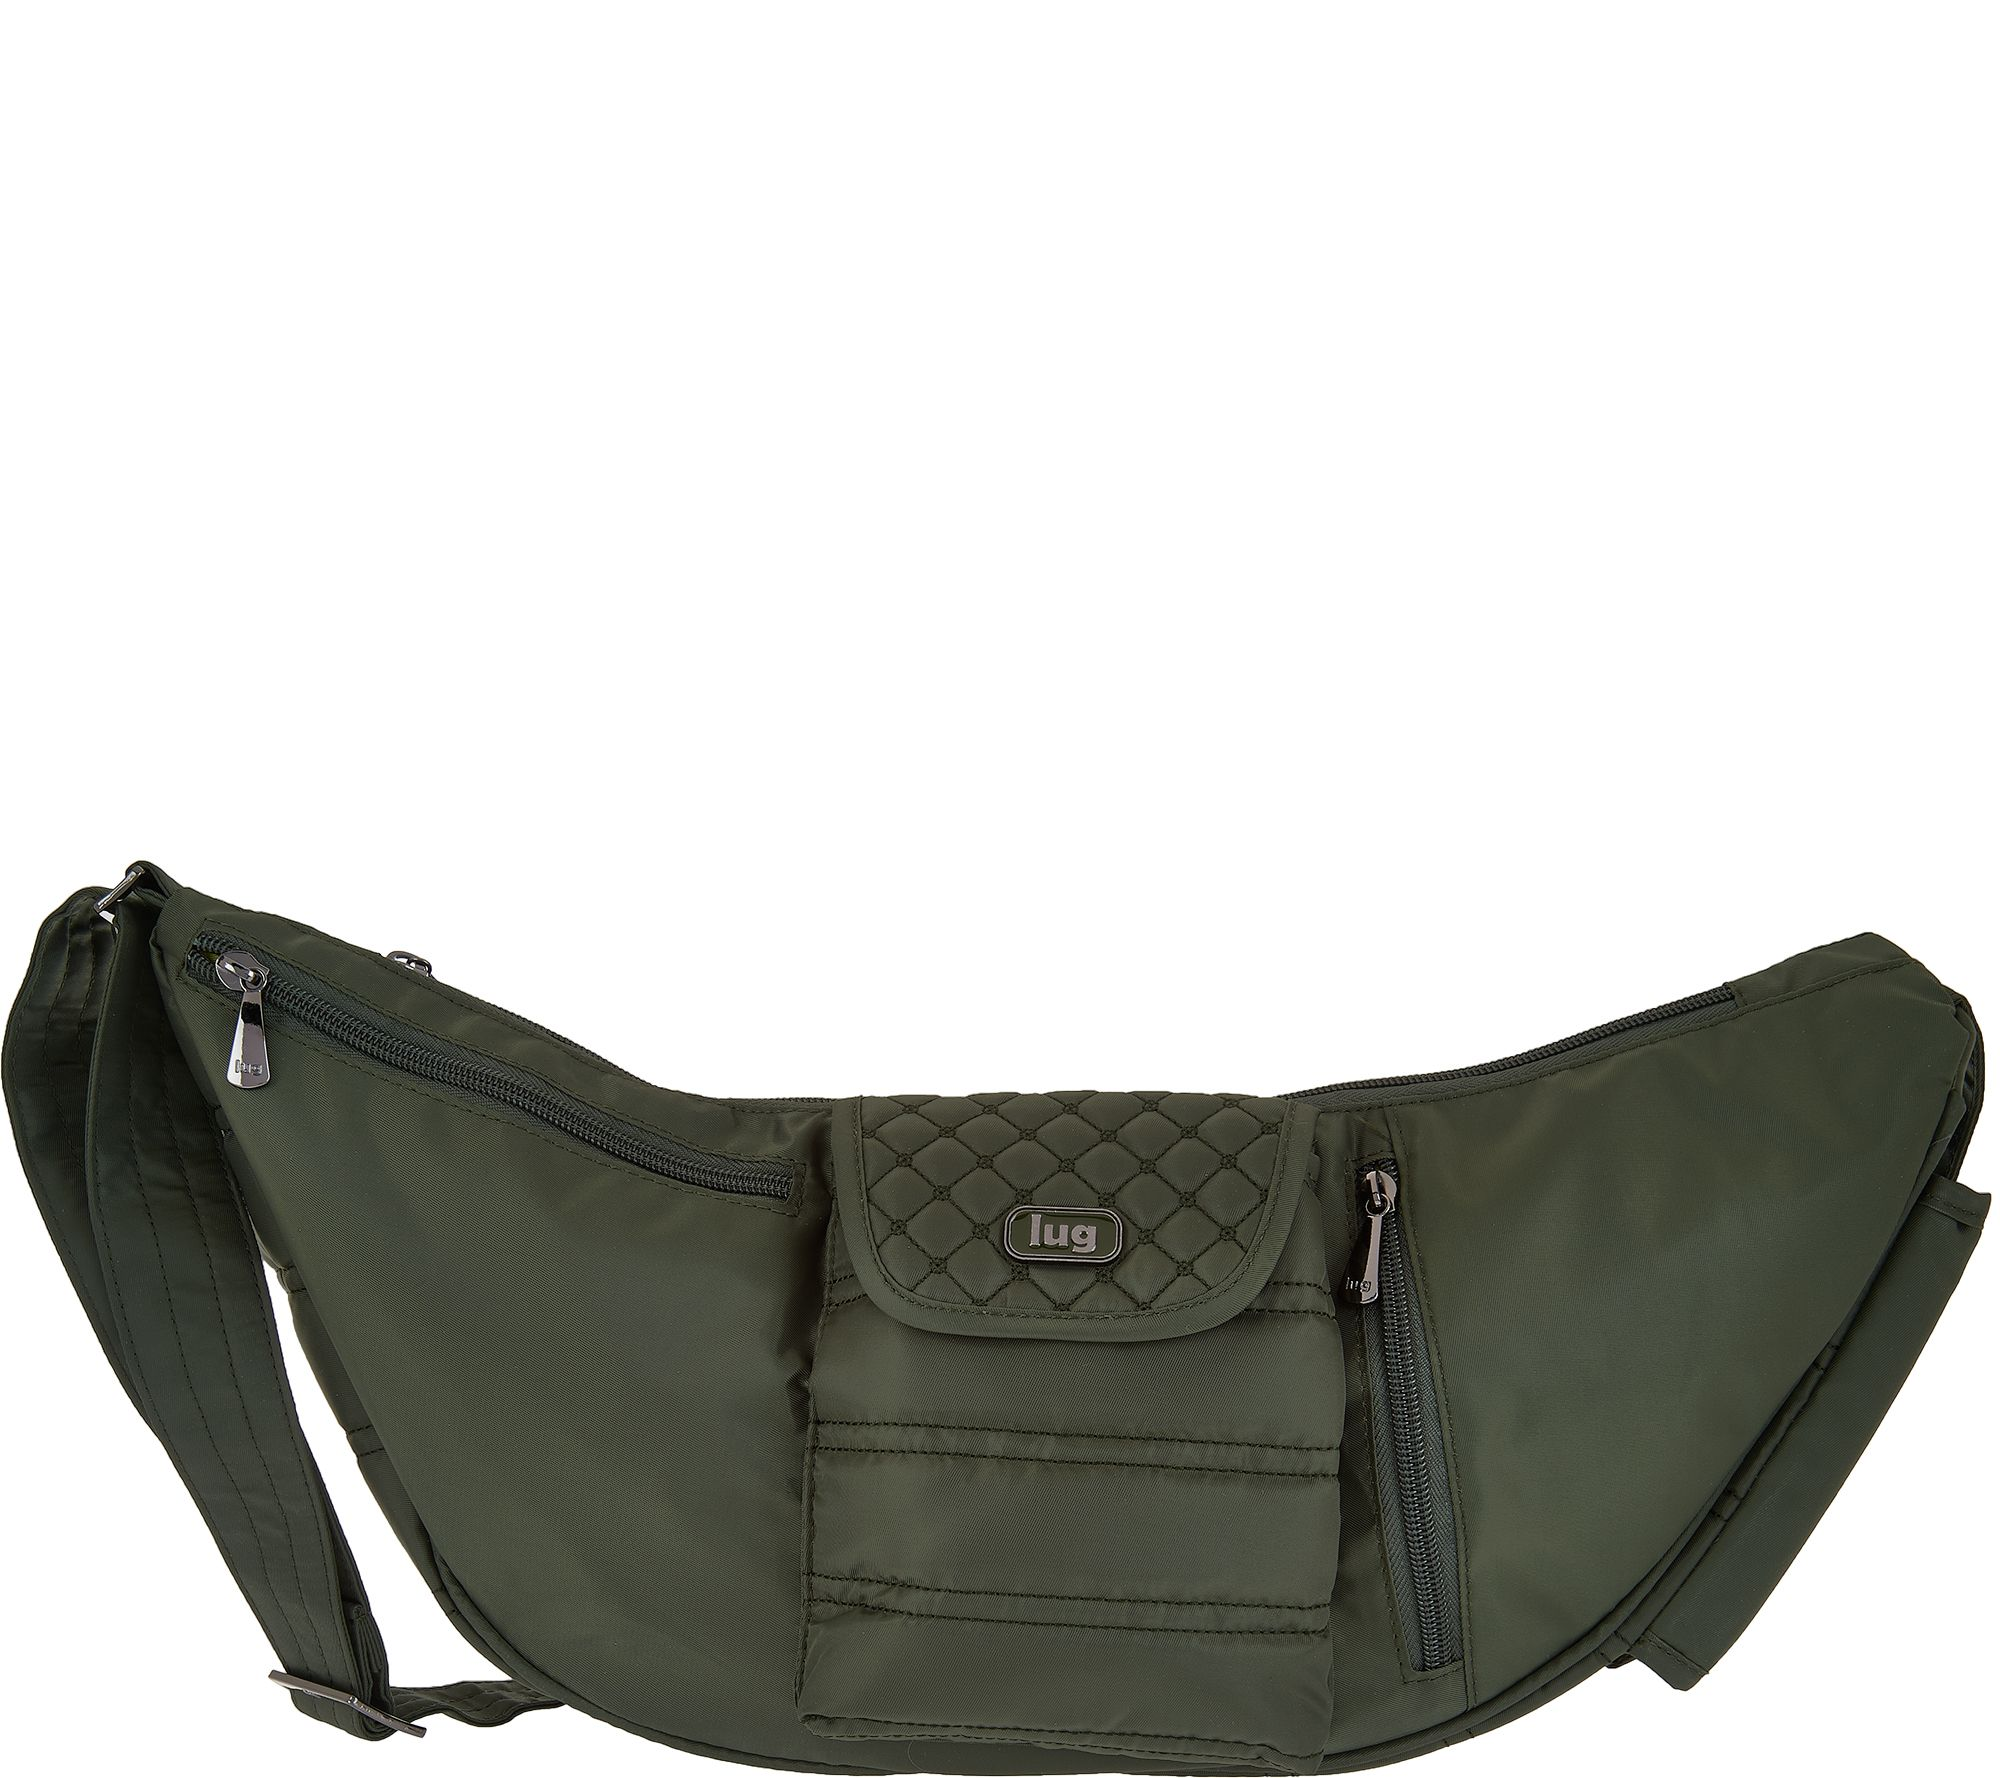 Lug Sling Bag - Boomerang - Page 1 — QVC.com